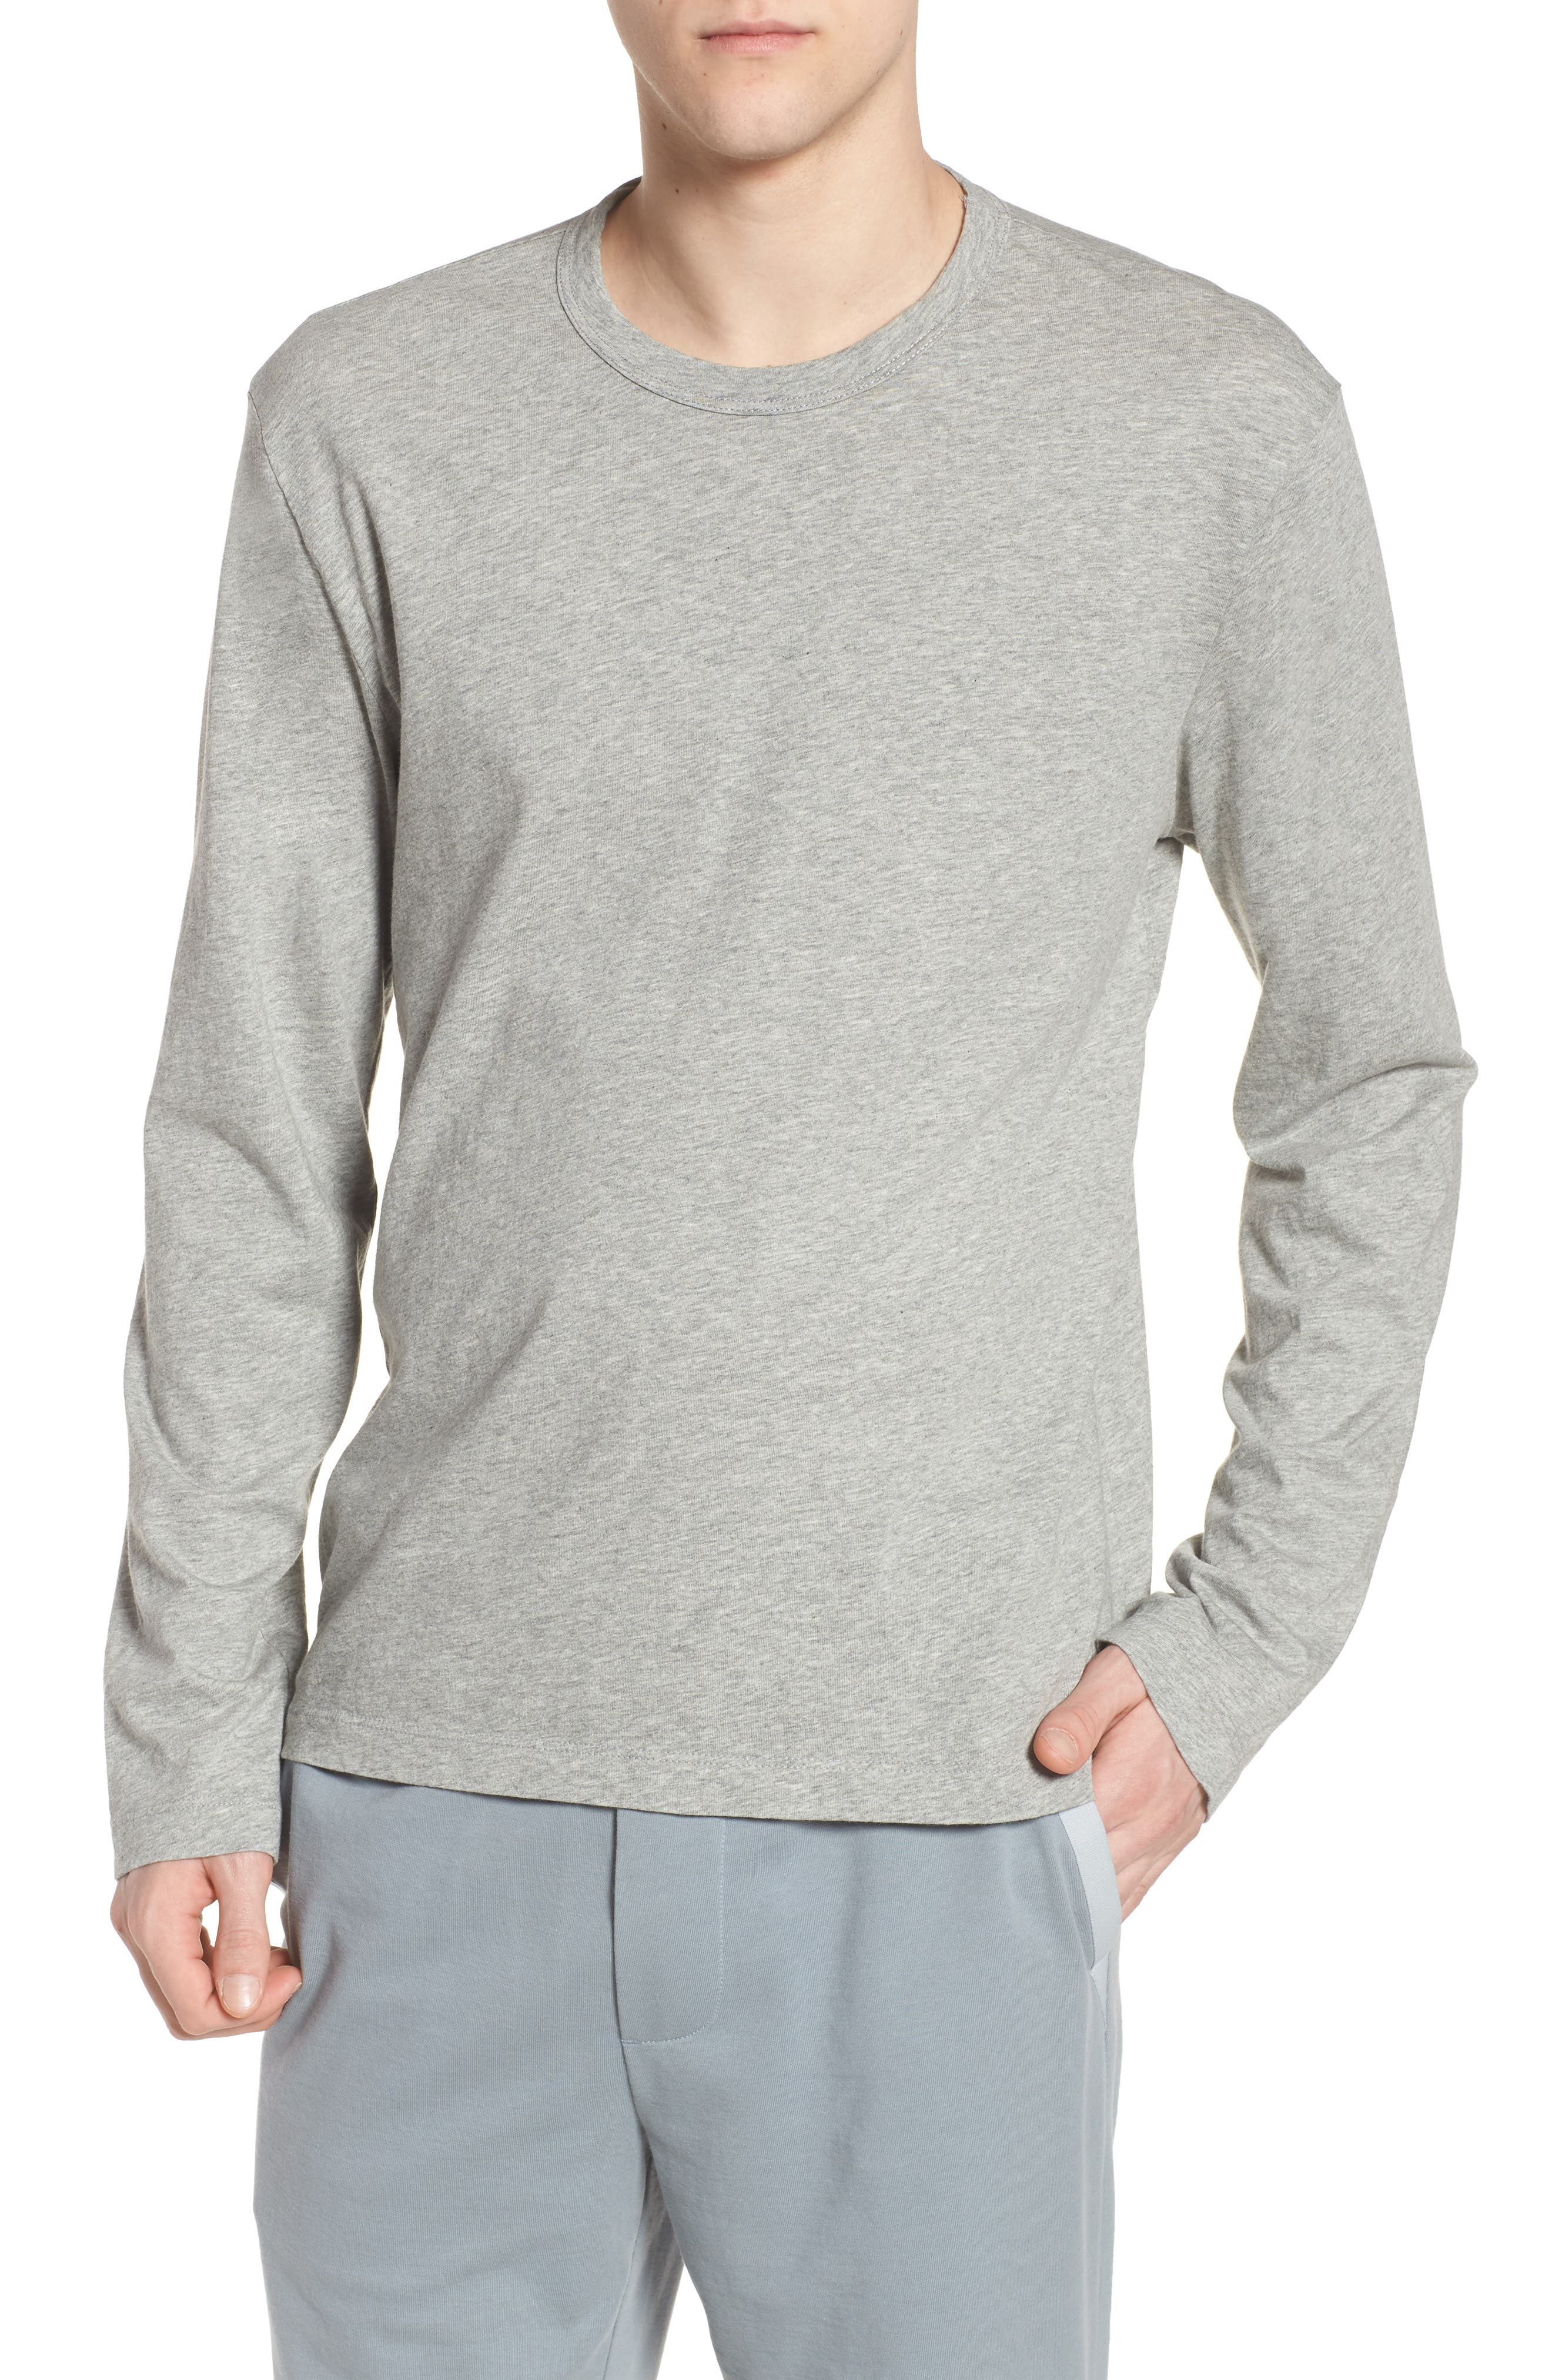 Main Image - James Perse Crewneck Cotton Sweatshirt